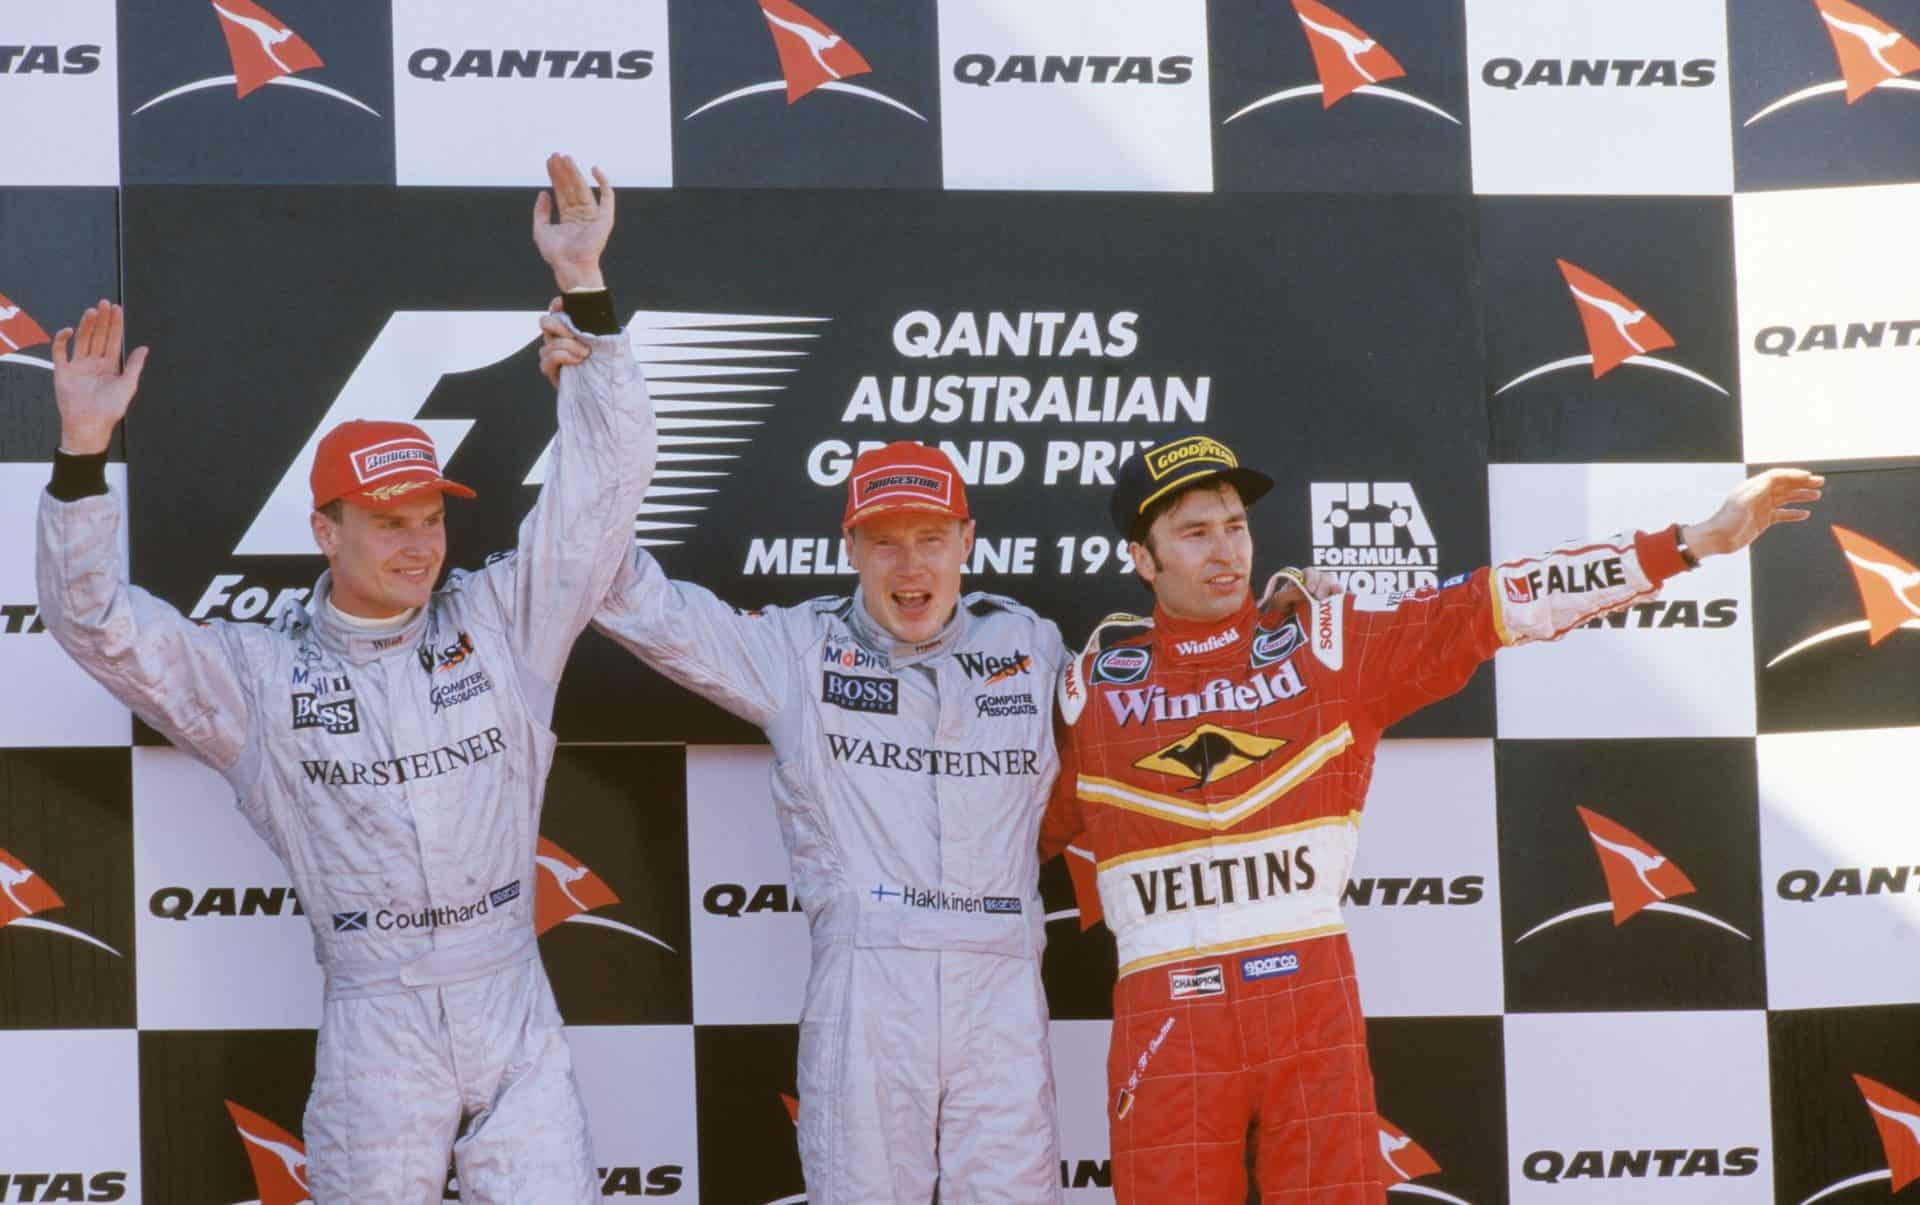 1998-Australian-GP-podium-F1-Hakkinen-Coulthard-Frentzen-Photo-Williams